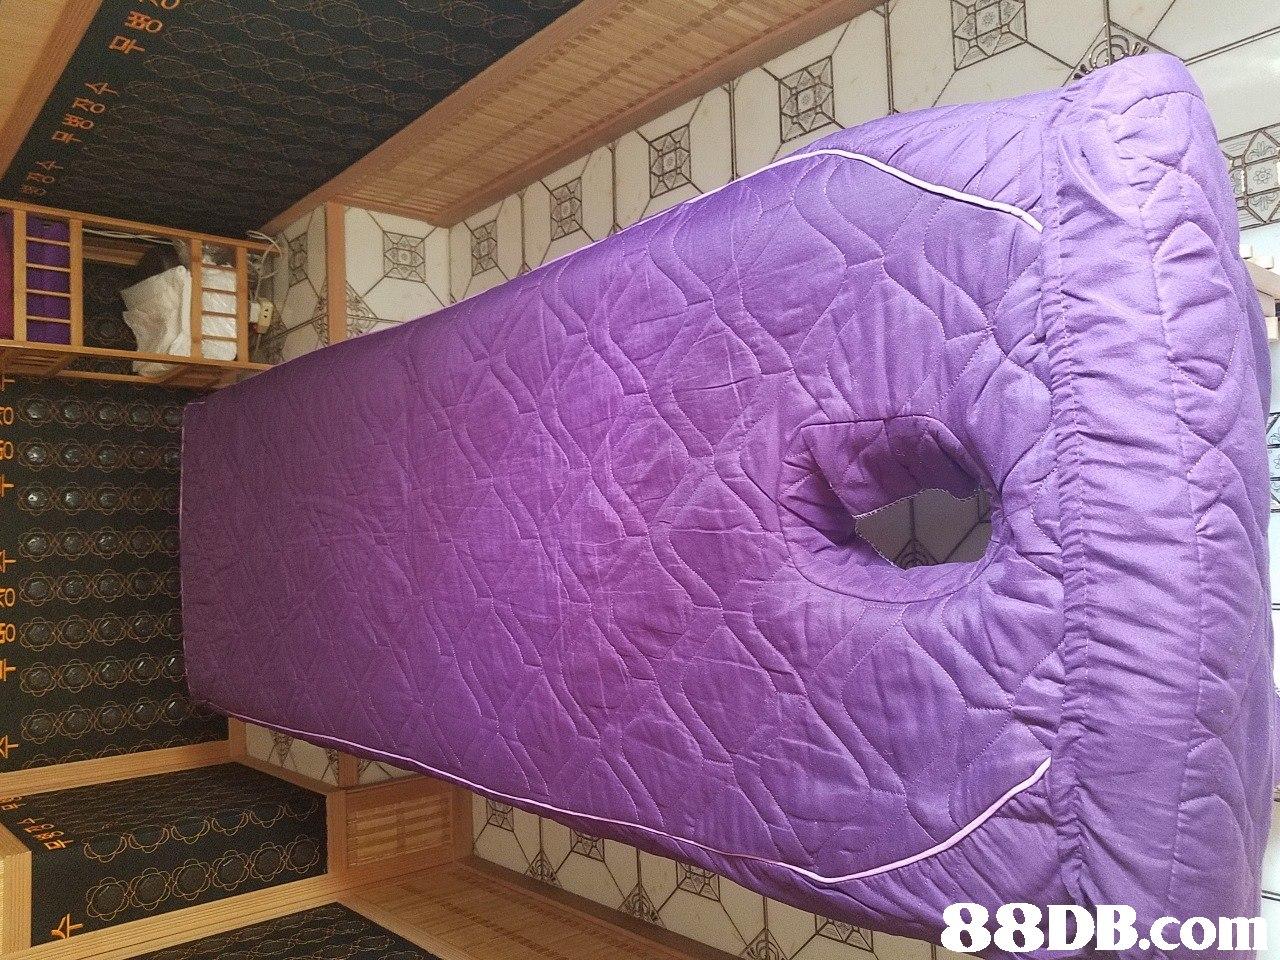 0 88DB.com  purple